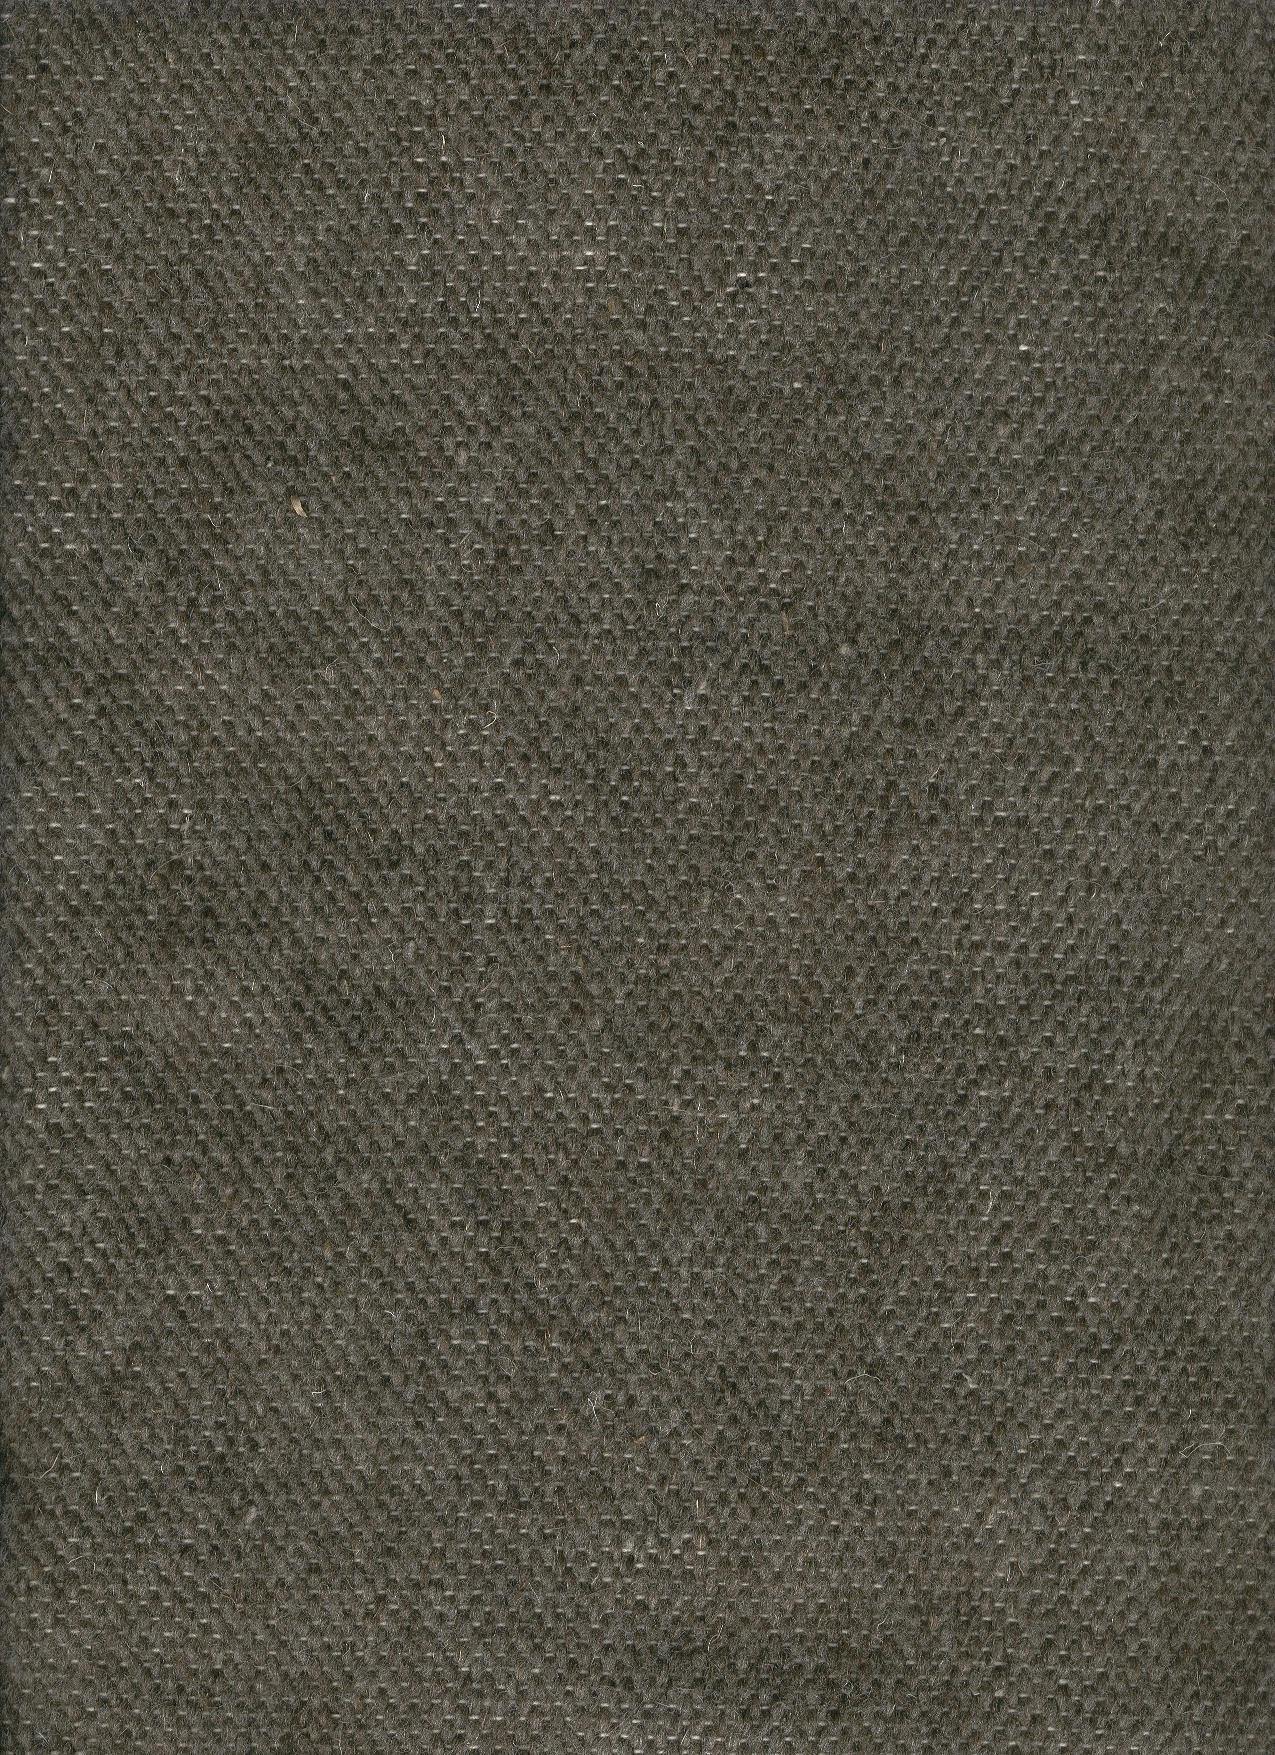 brown burlap texture background - photo #22